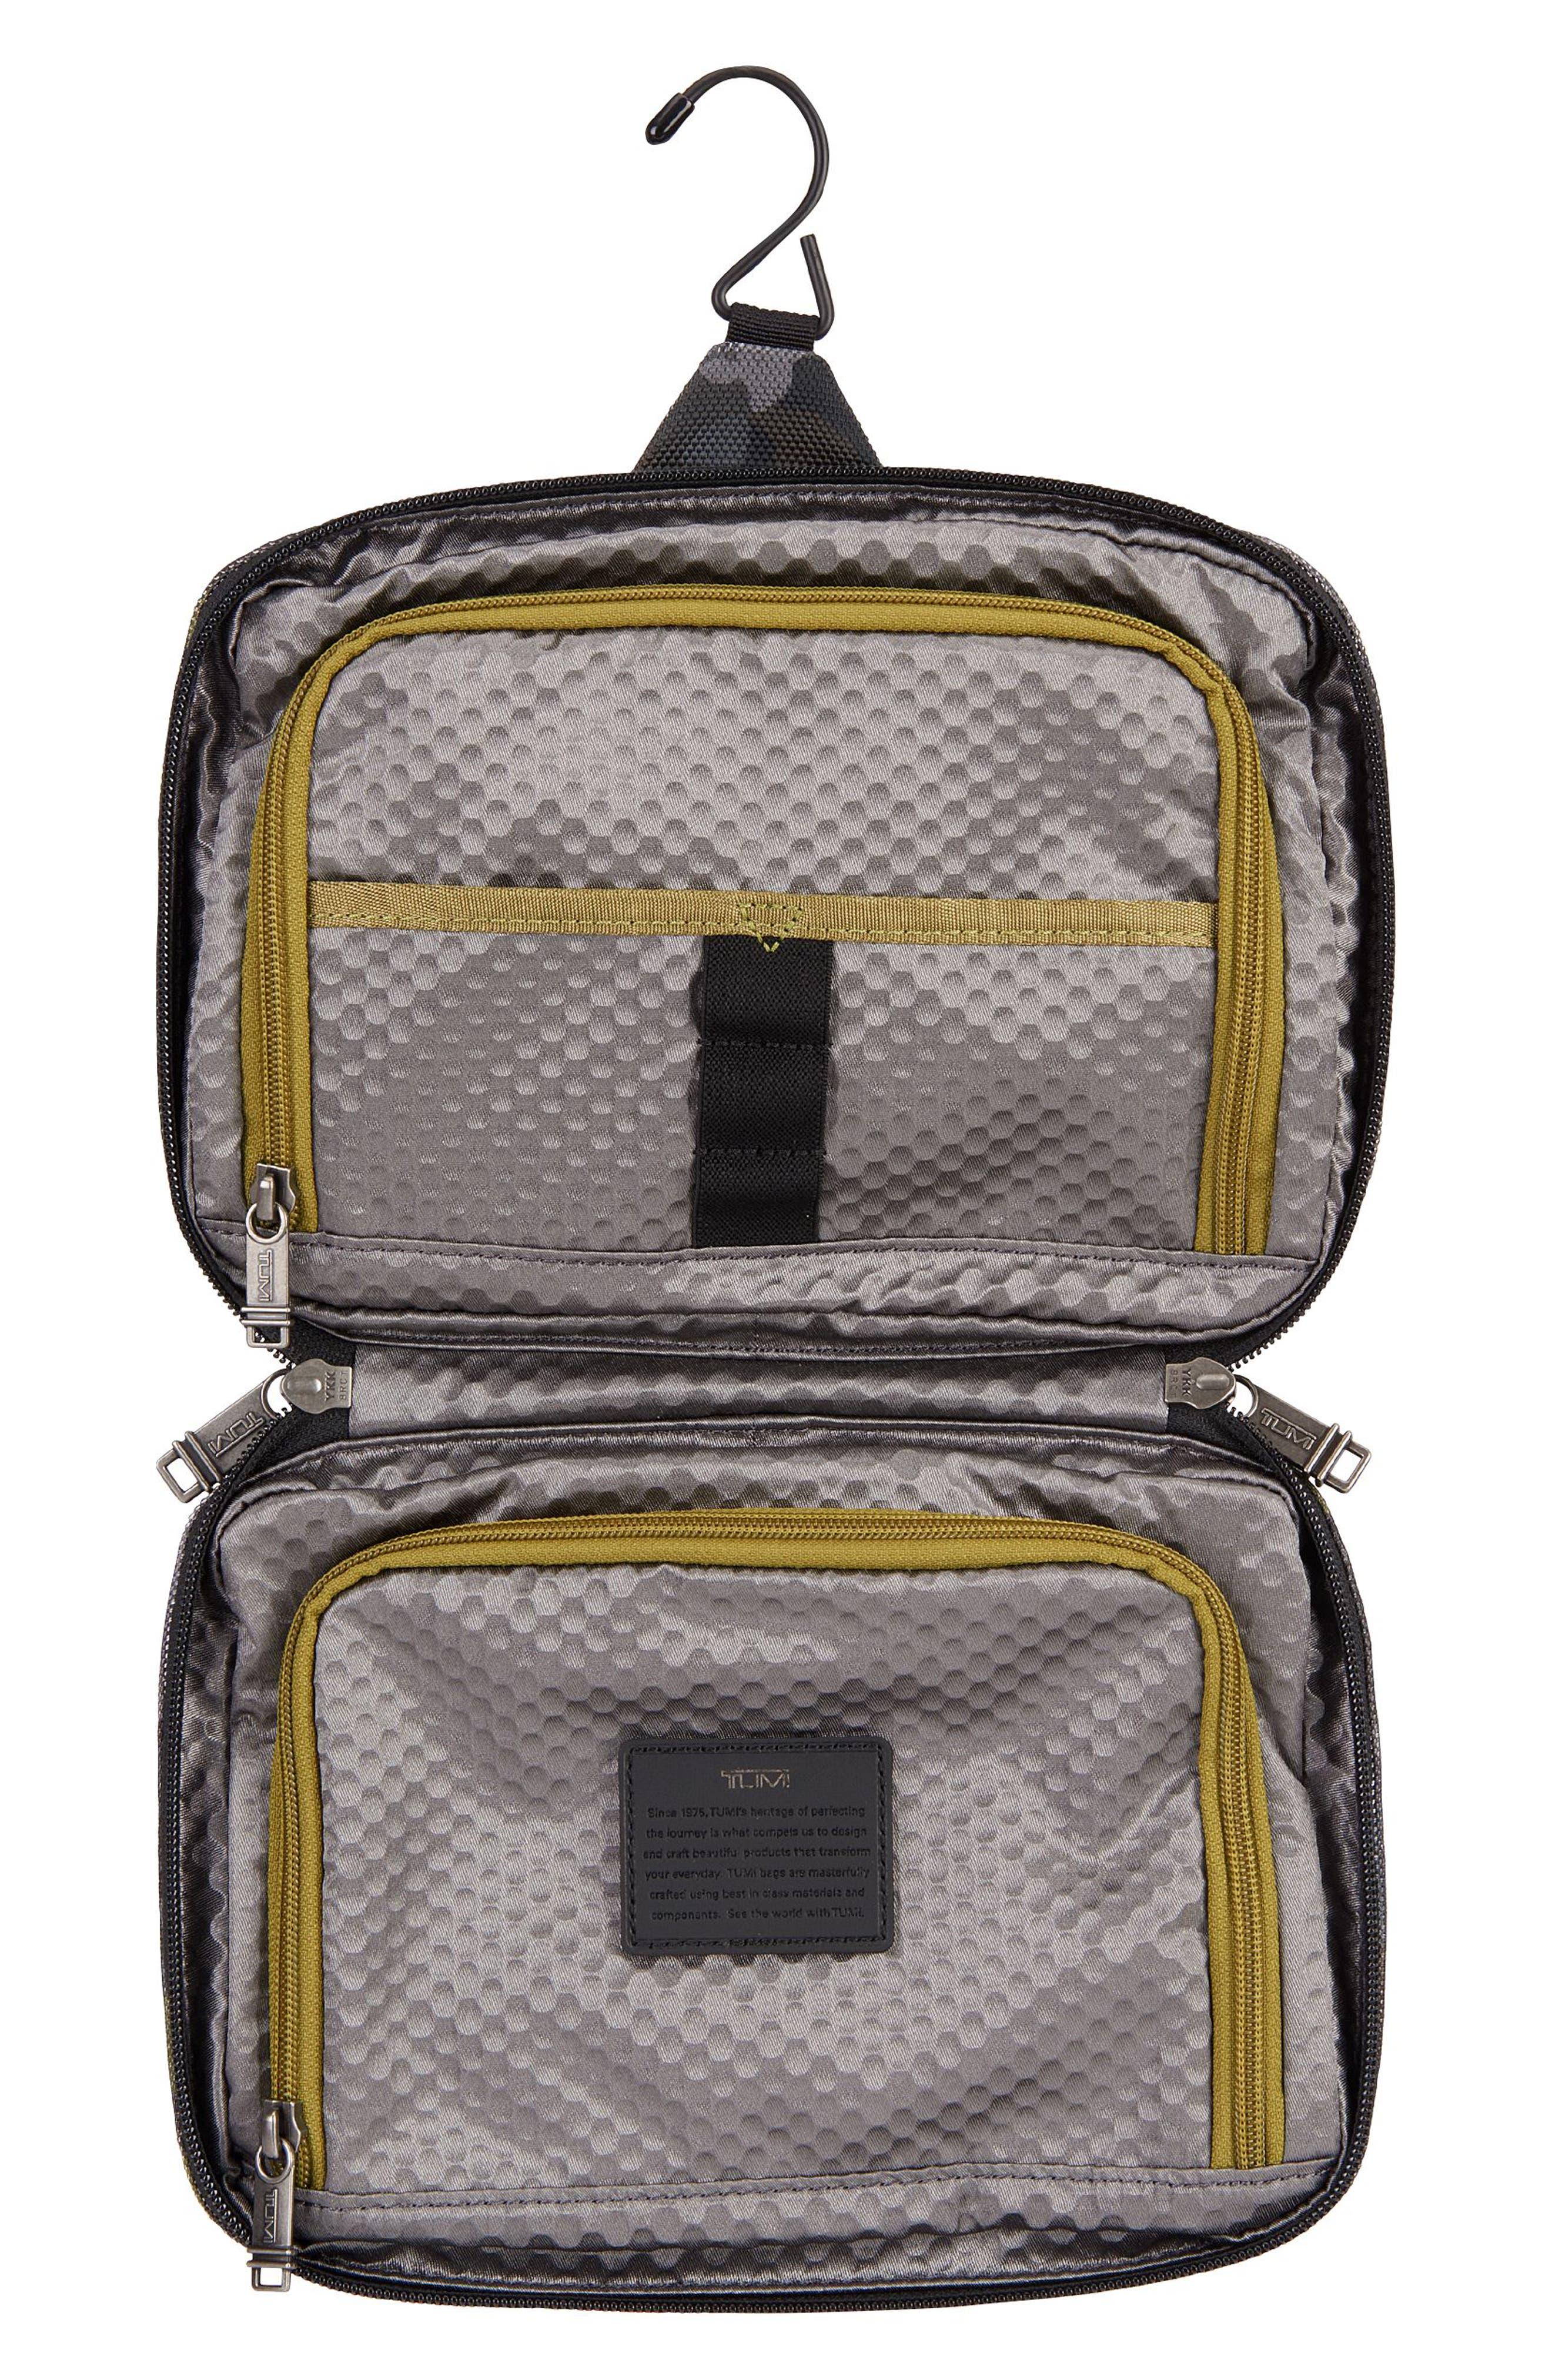 Alpha Bravo - Reno Travel Kit,                             Alternate thumbnail 3, color,                             Green Camo